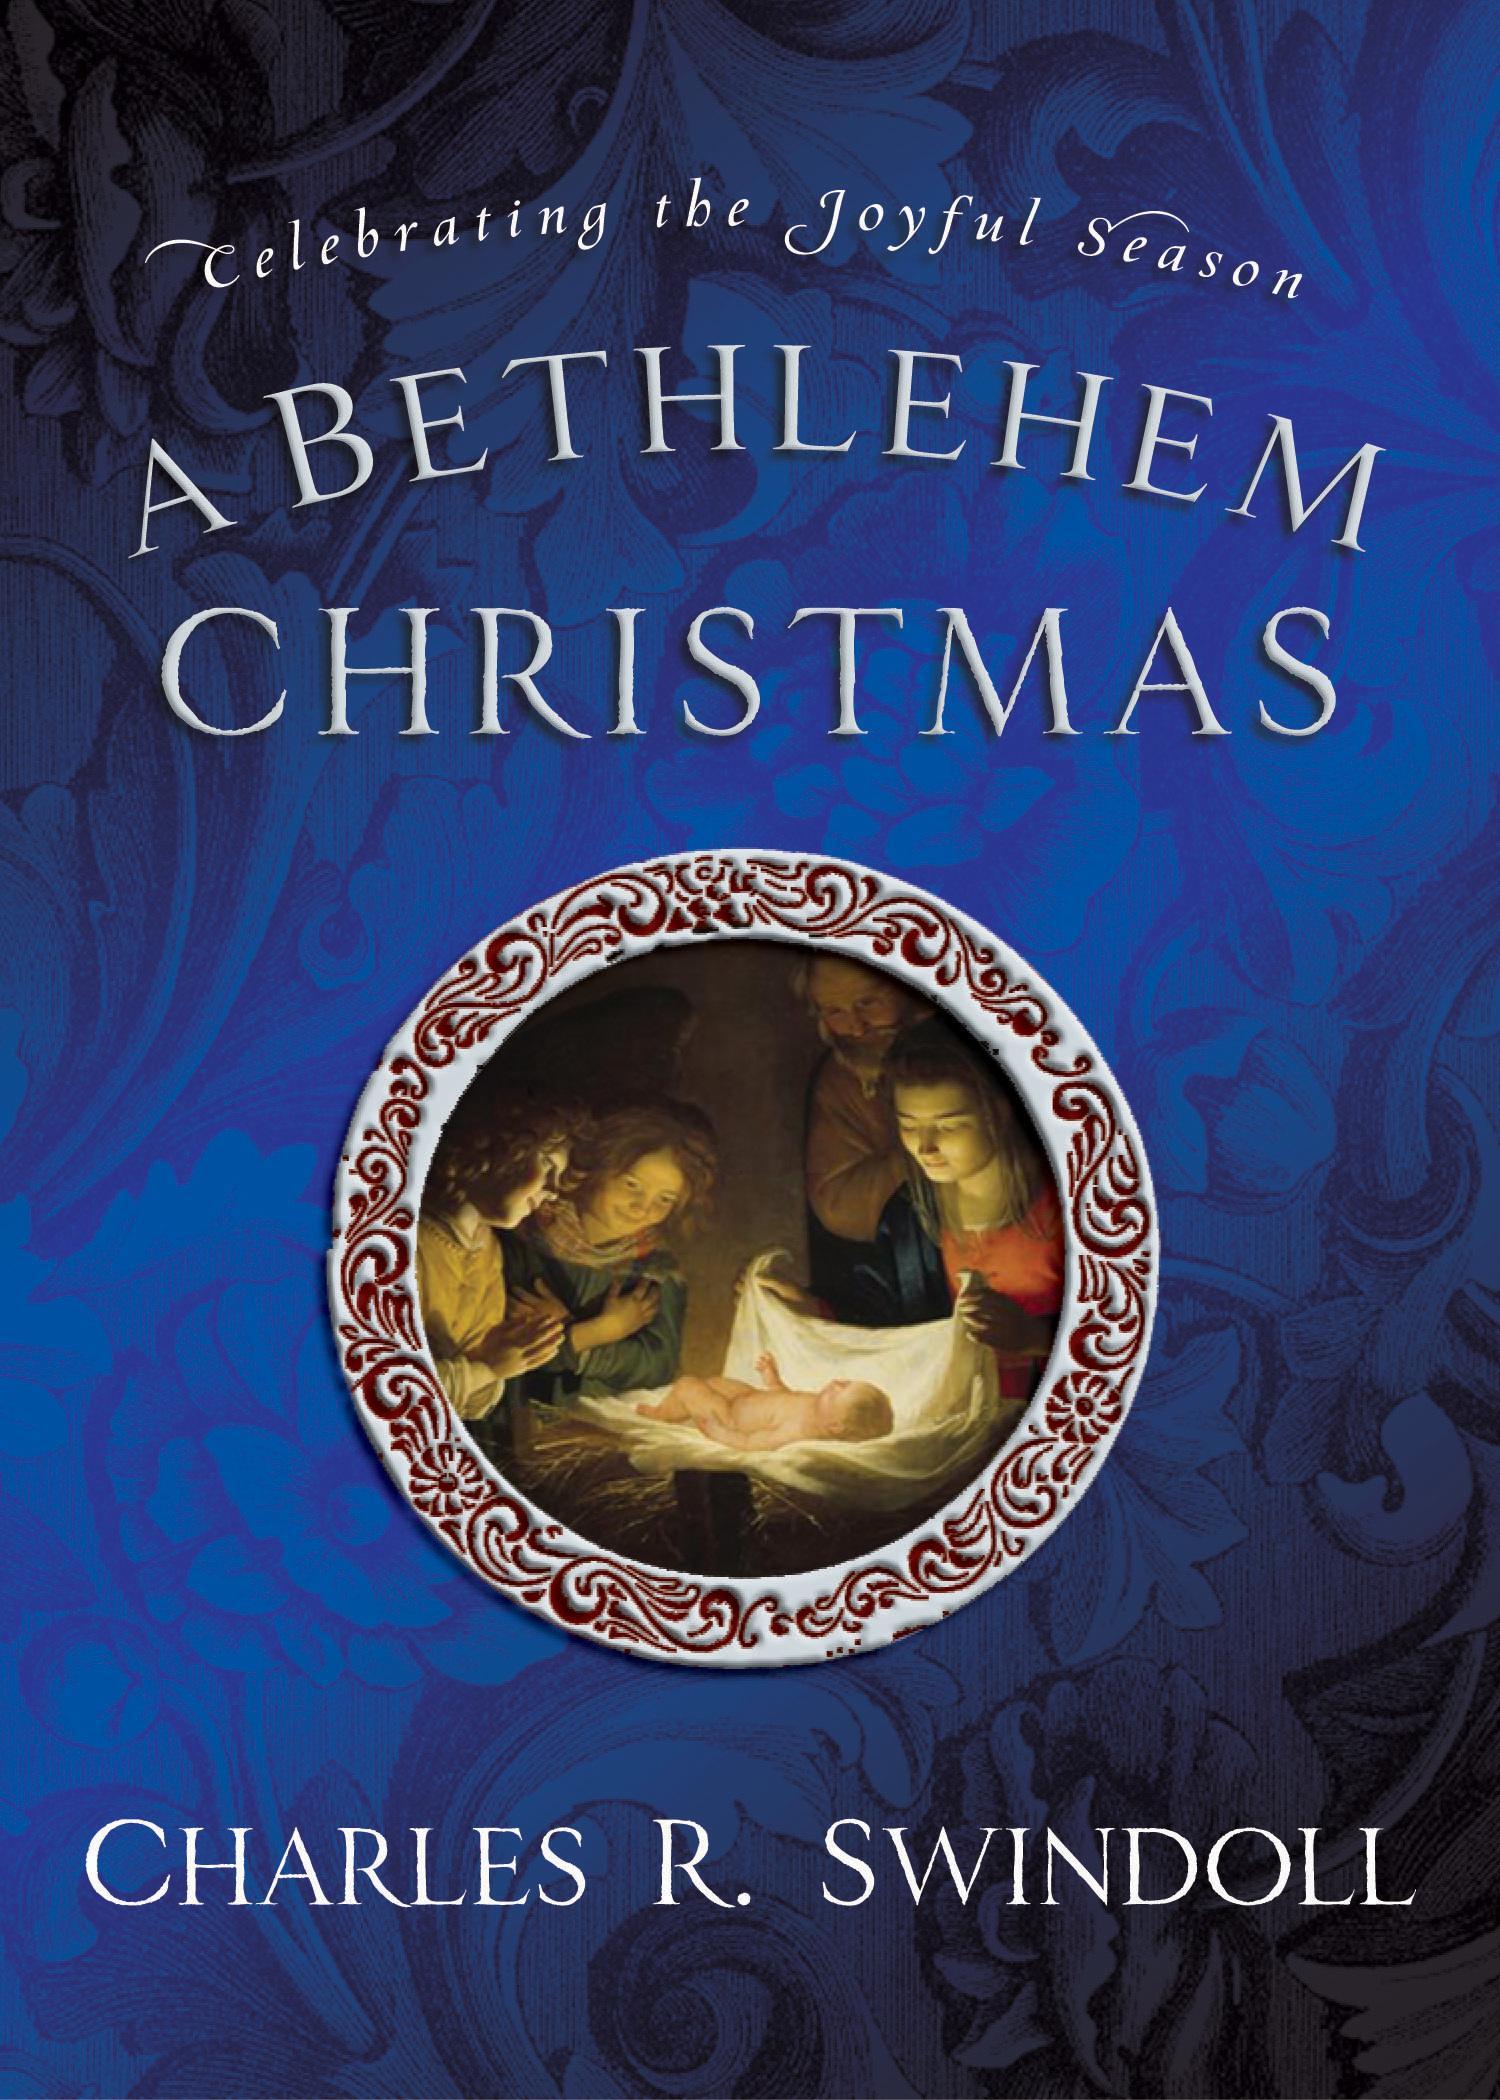 A Bethlehem Christmas: Celebrating the Joyful Season